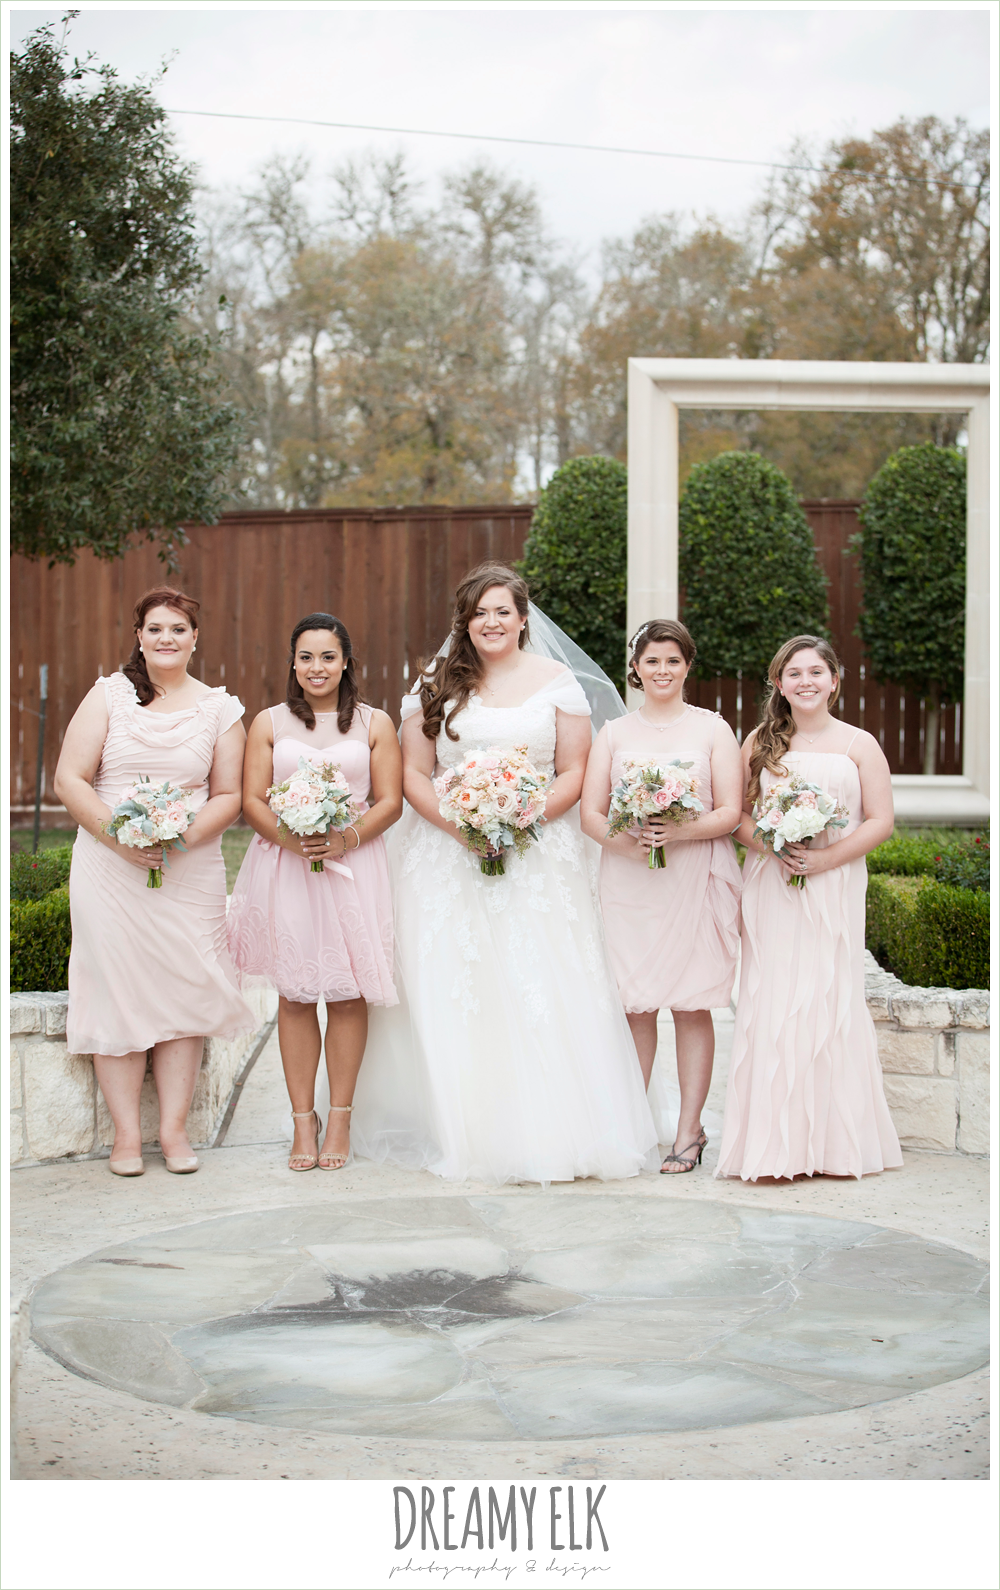 blush toned bridesmaids dresses, houston winter wedding {dreamy elk photography and design}